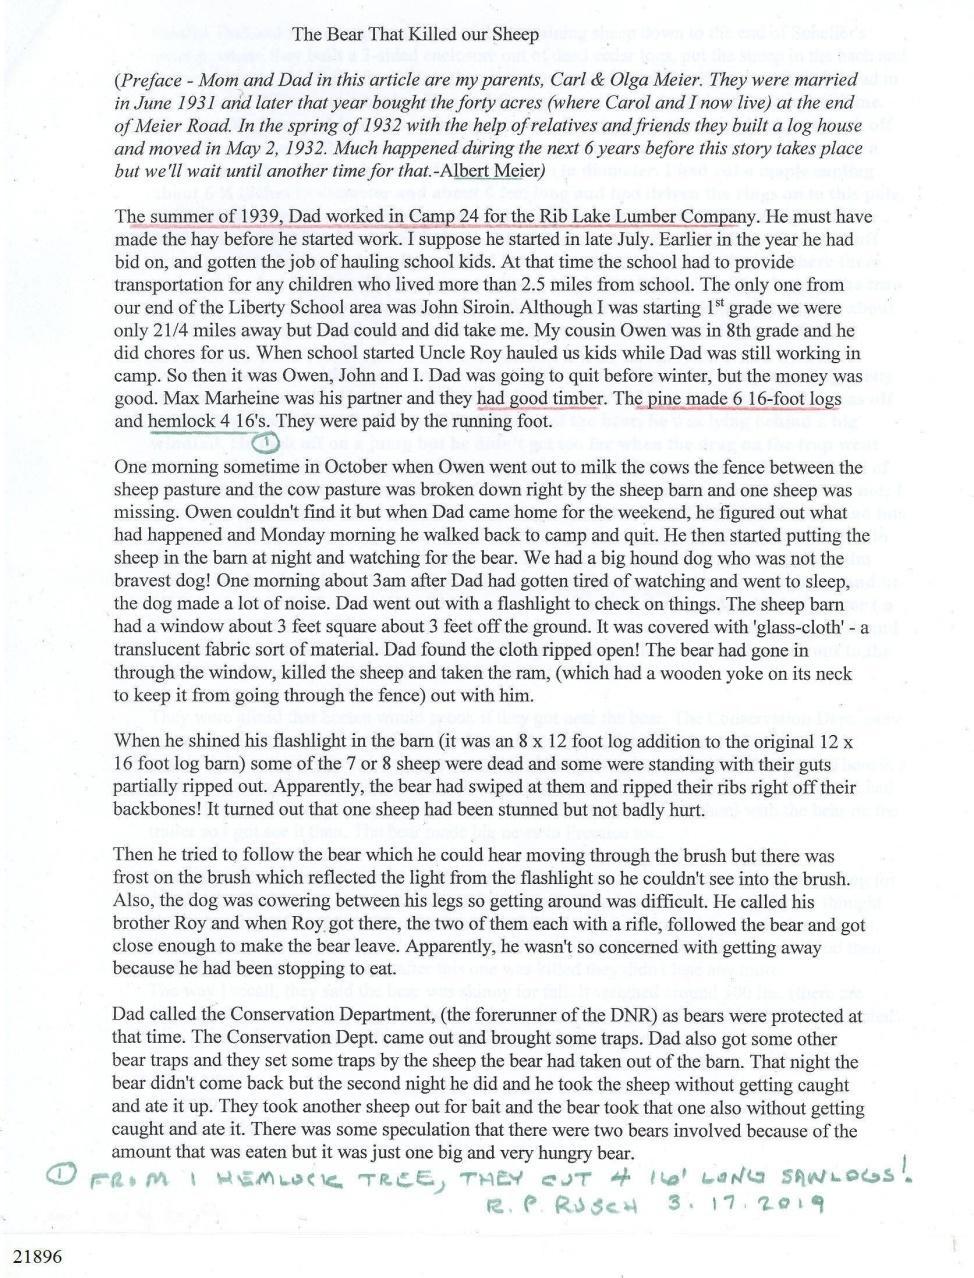 "C:\Users\Robert P. Rusch\Desktop\II. RLHSoc\Documents & Photos-Scanned\Rib Lake History 21800-21899\21896 W. by Albert Meier c. 1990 ""The Bear that Killed our Sheep"", p. 1.jpg"